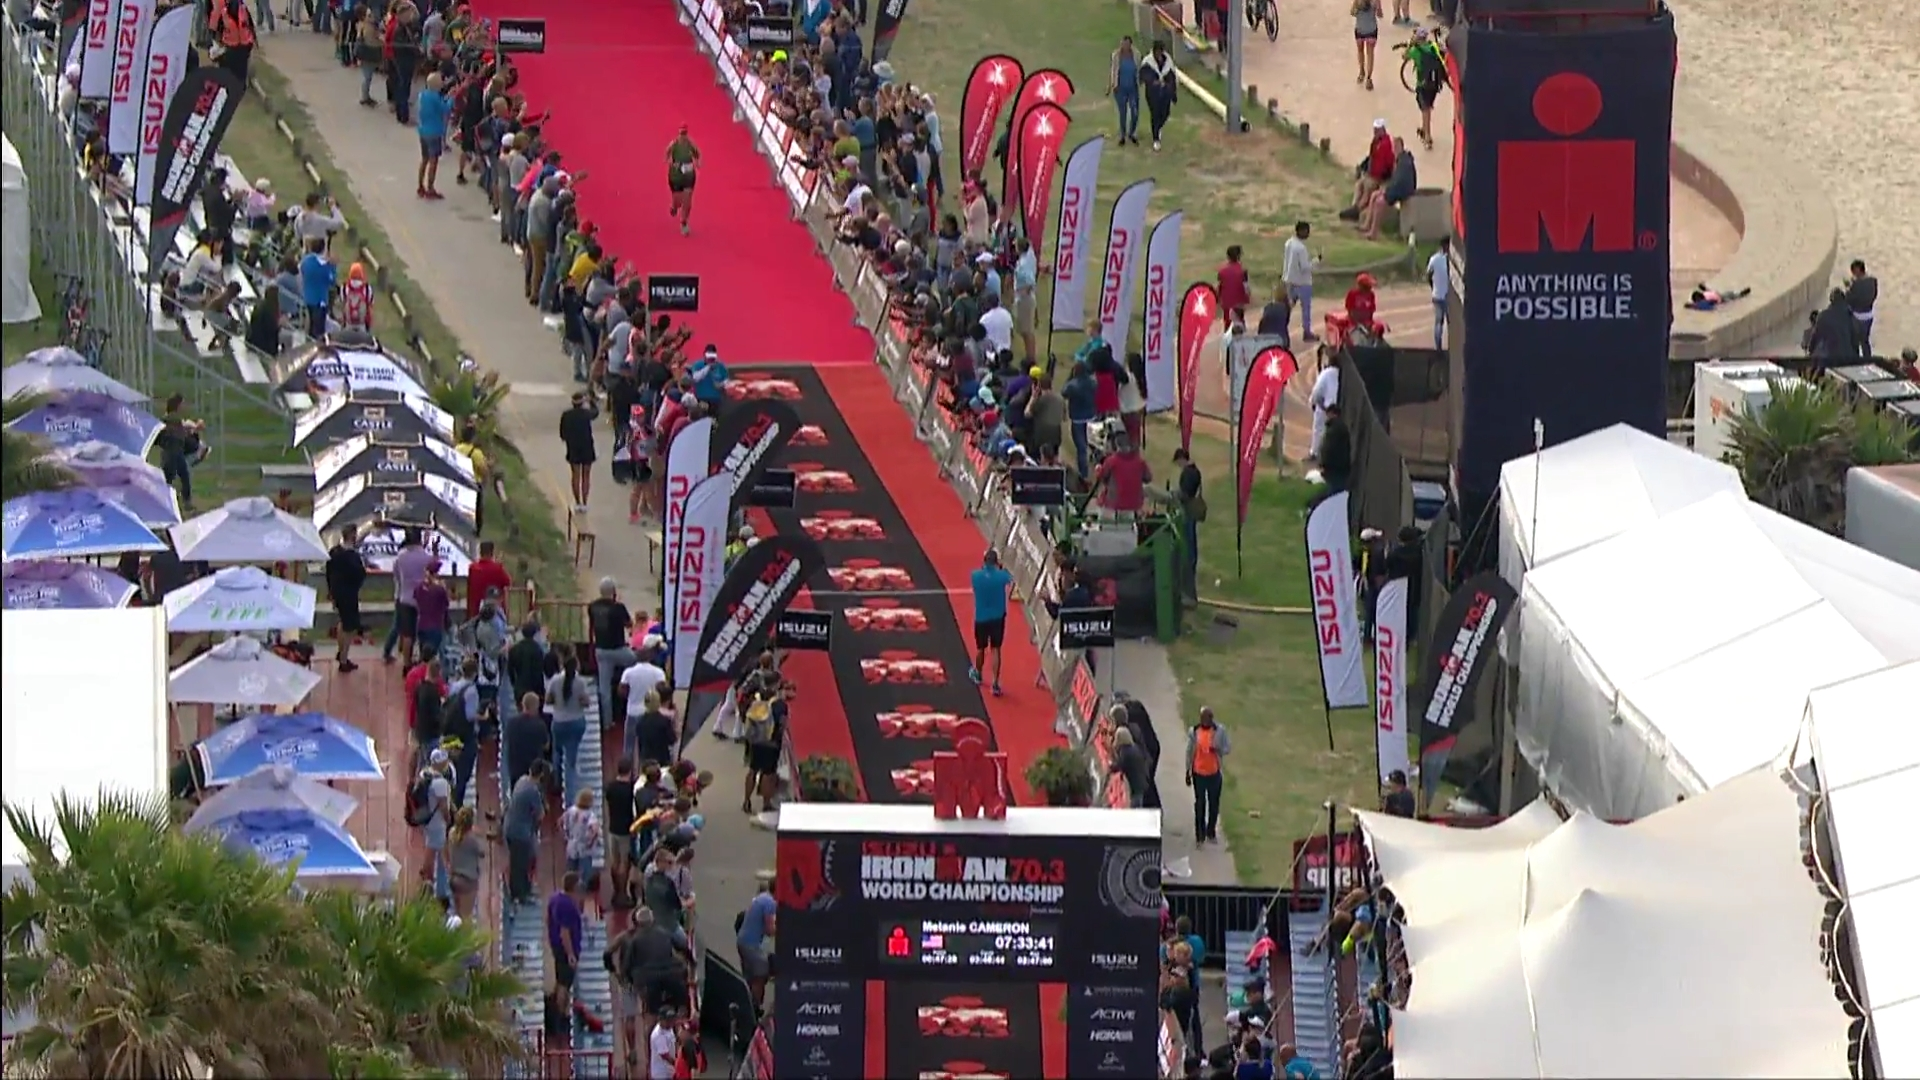 Melanie Cameron – Ironman World Championship 2018 13